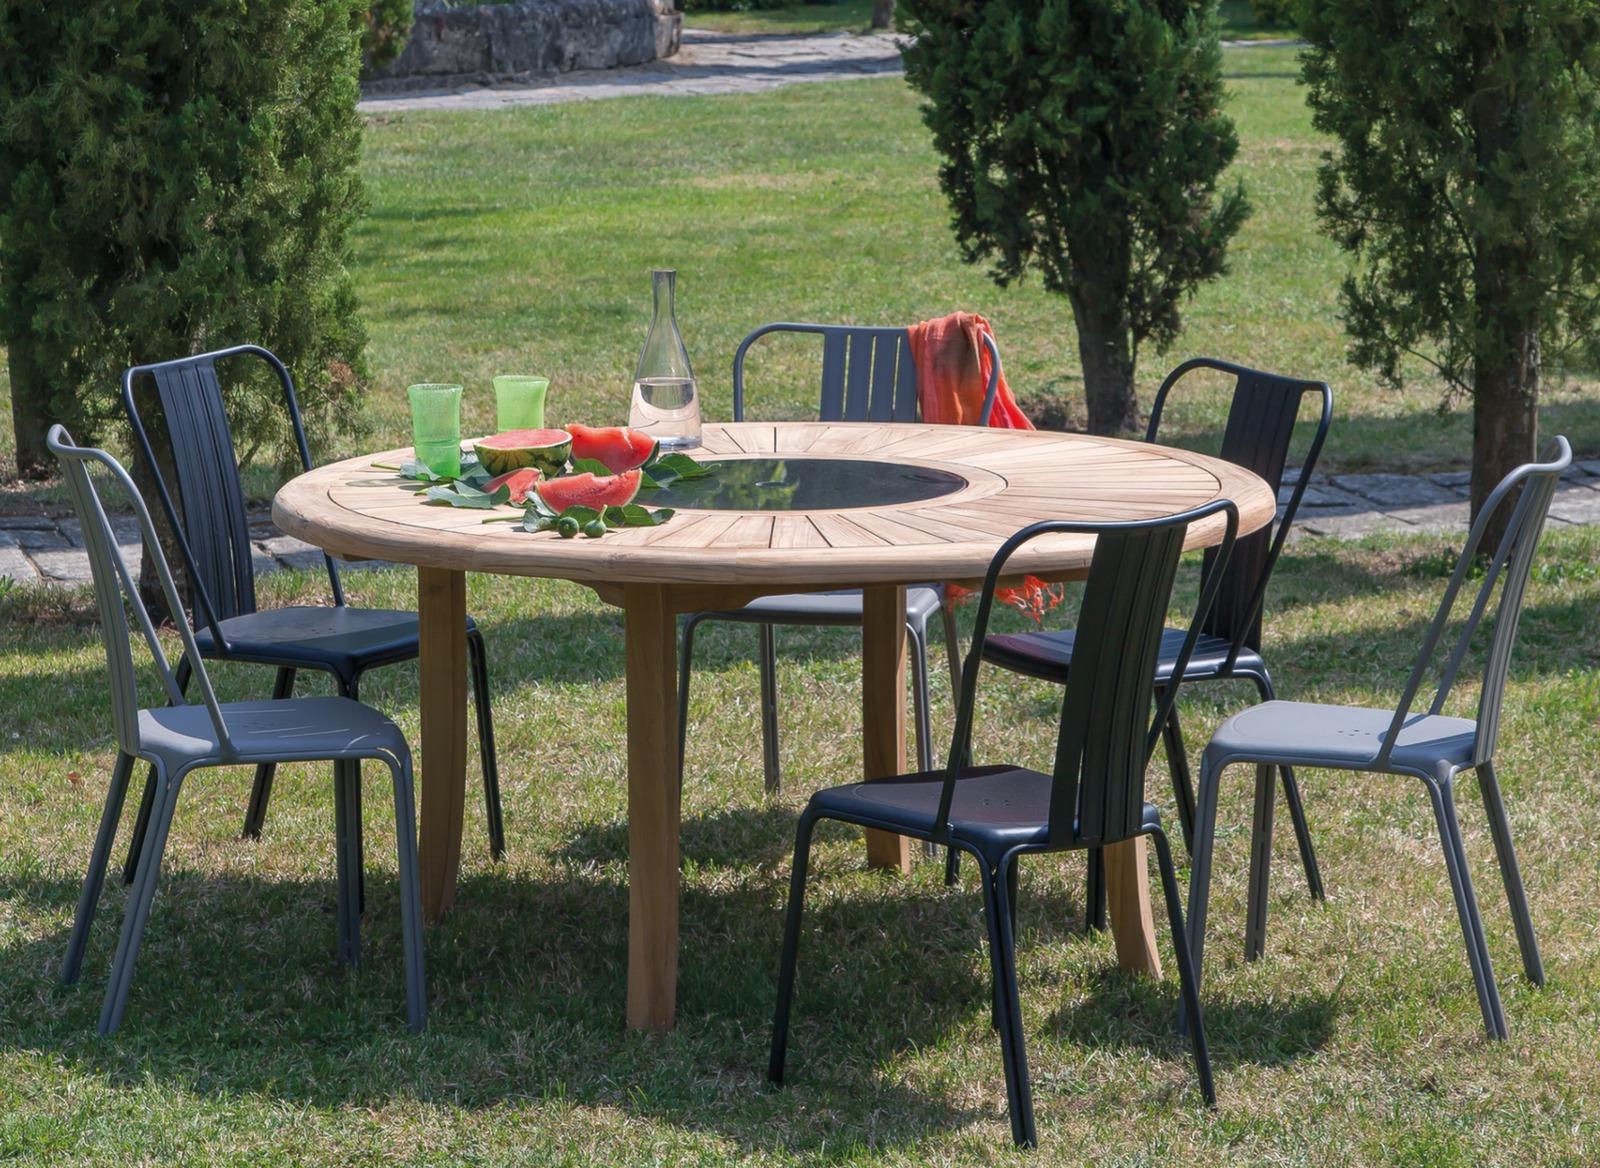 HOUSSE PROTECTION POUR TABLE 160x160 POLYESTER/PVC - GRIS